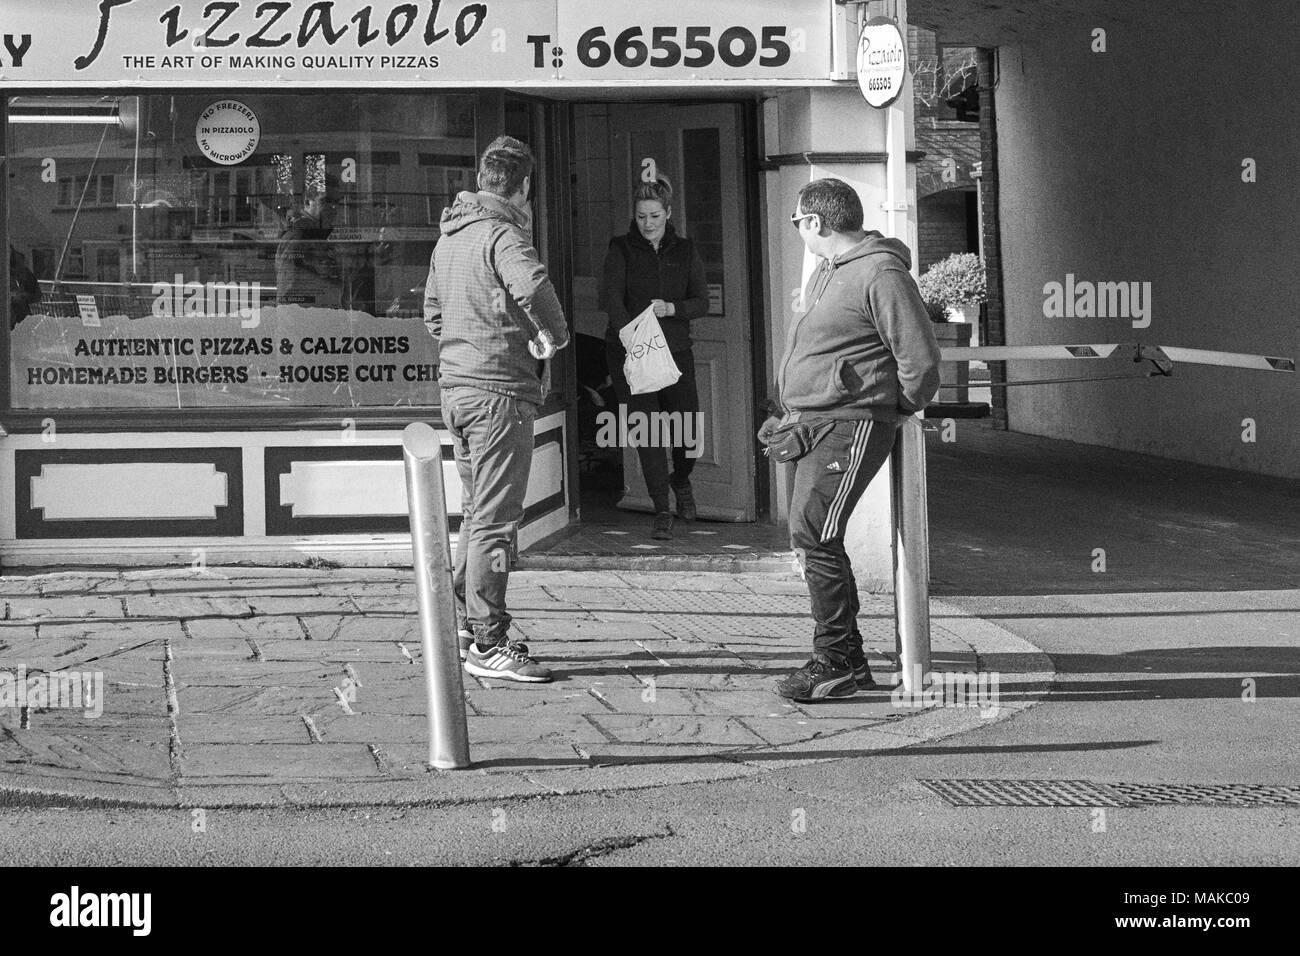 Pizzailo takeaway pizza shop on North Quay, Douglas, Isle of Man - Stock Image